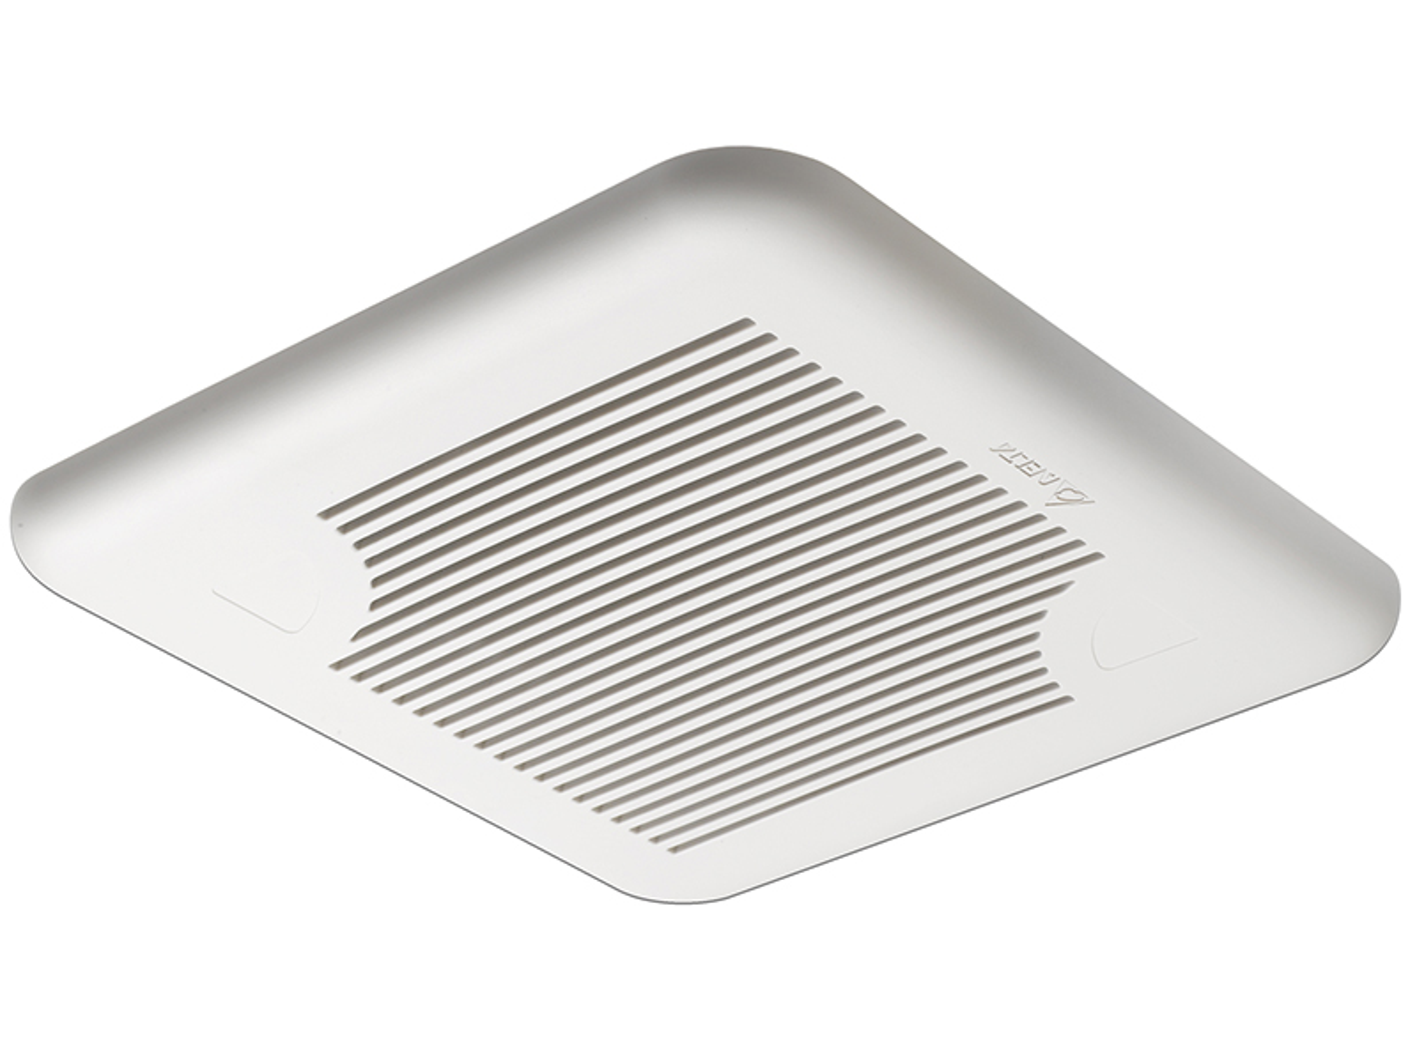 SIG80D fan grille